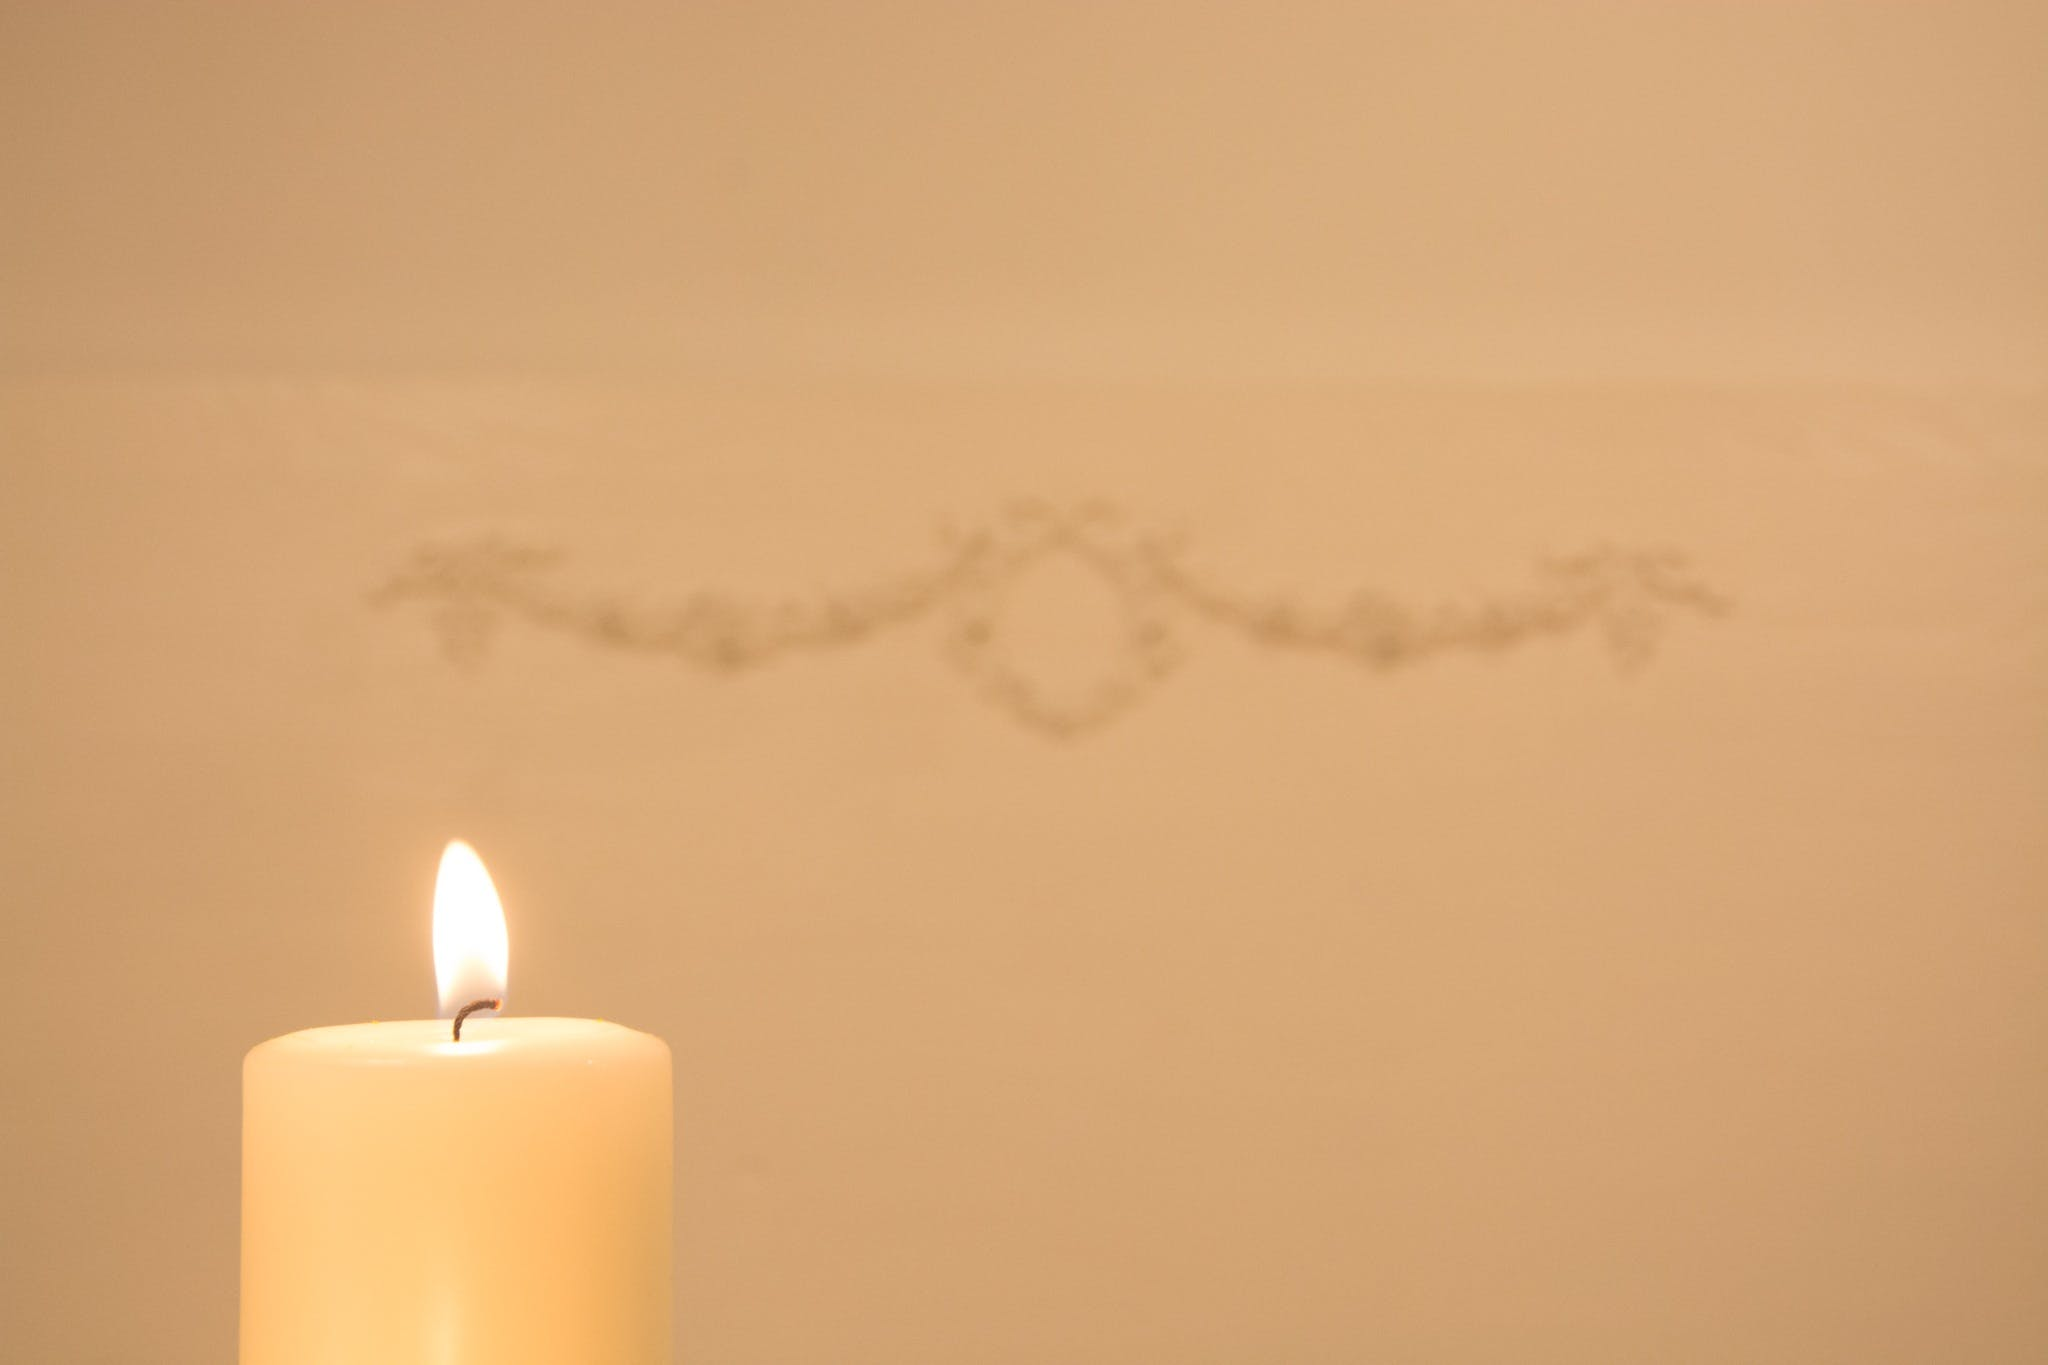 Free stock photo of light, romantic, white, relax